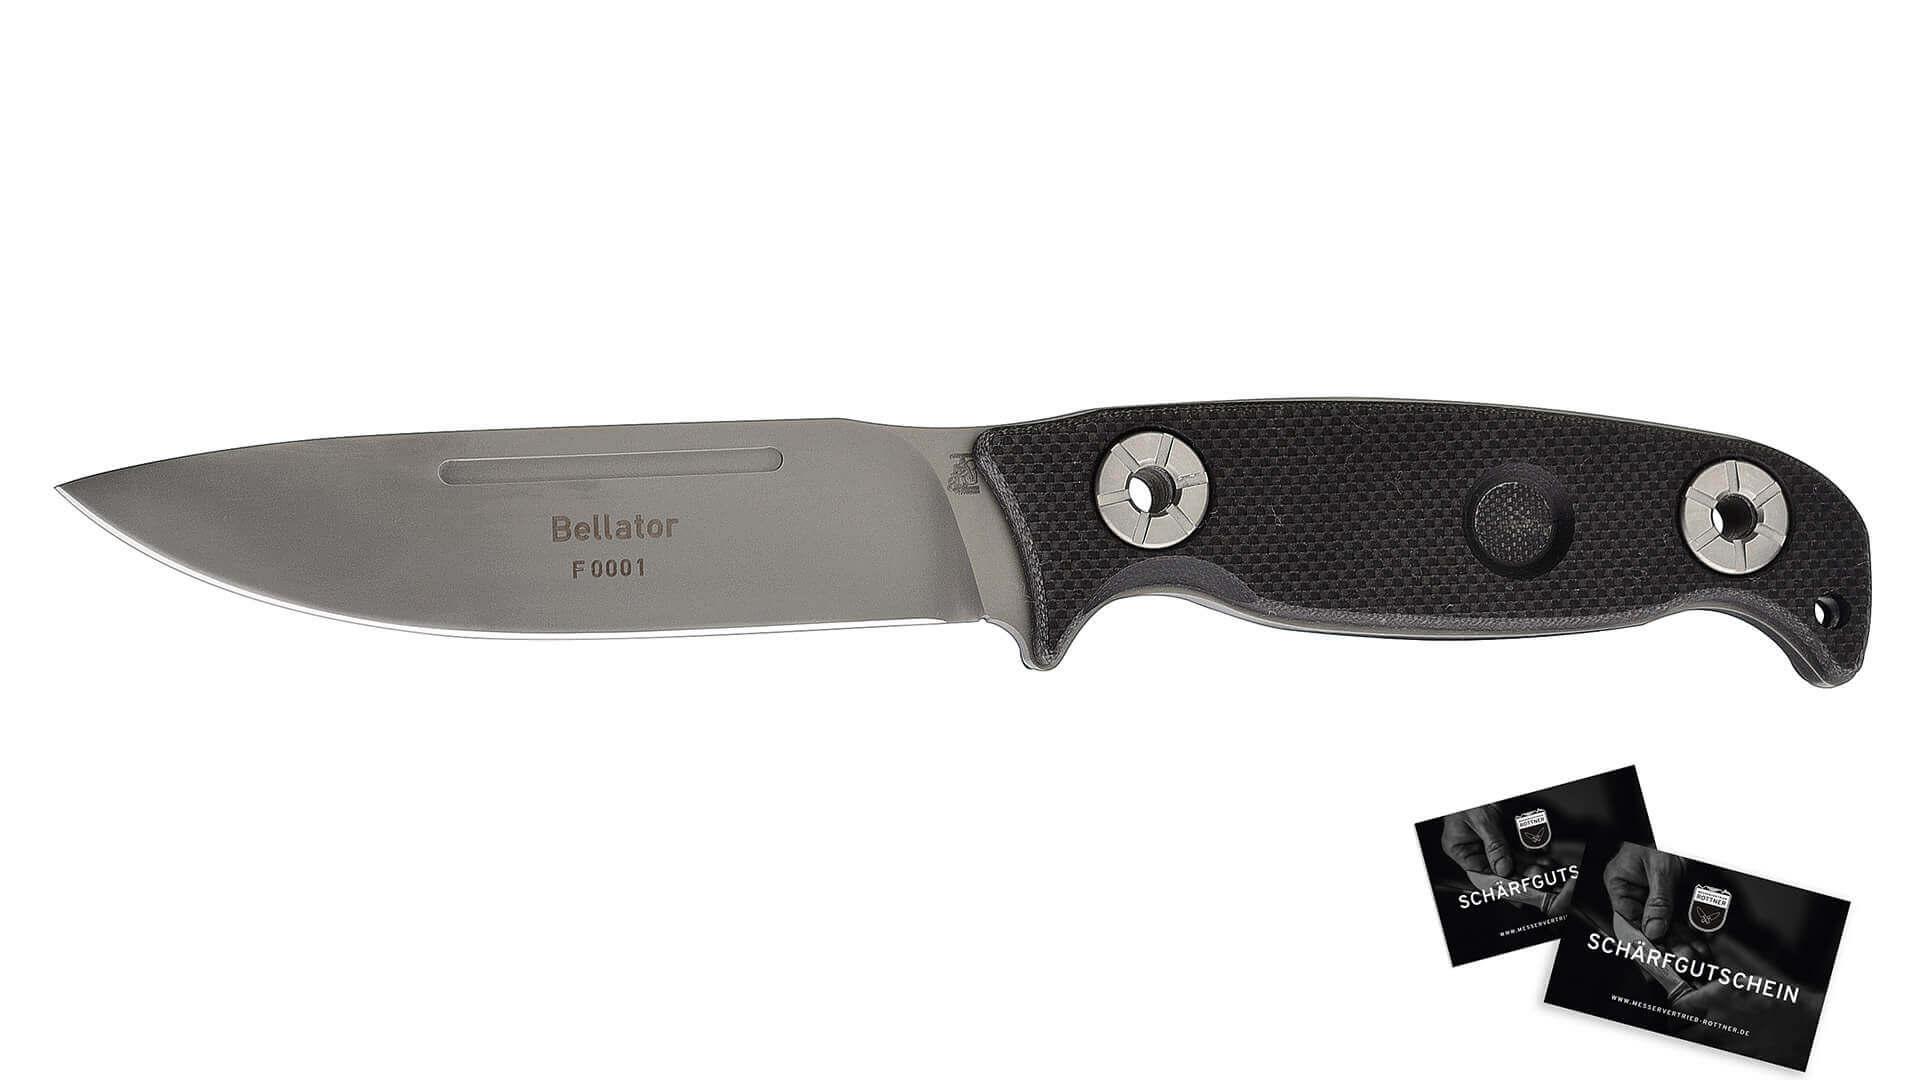 eickhorn-bellator-systema-messer-jagdmesser-outdoormesser